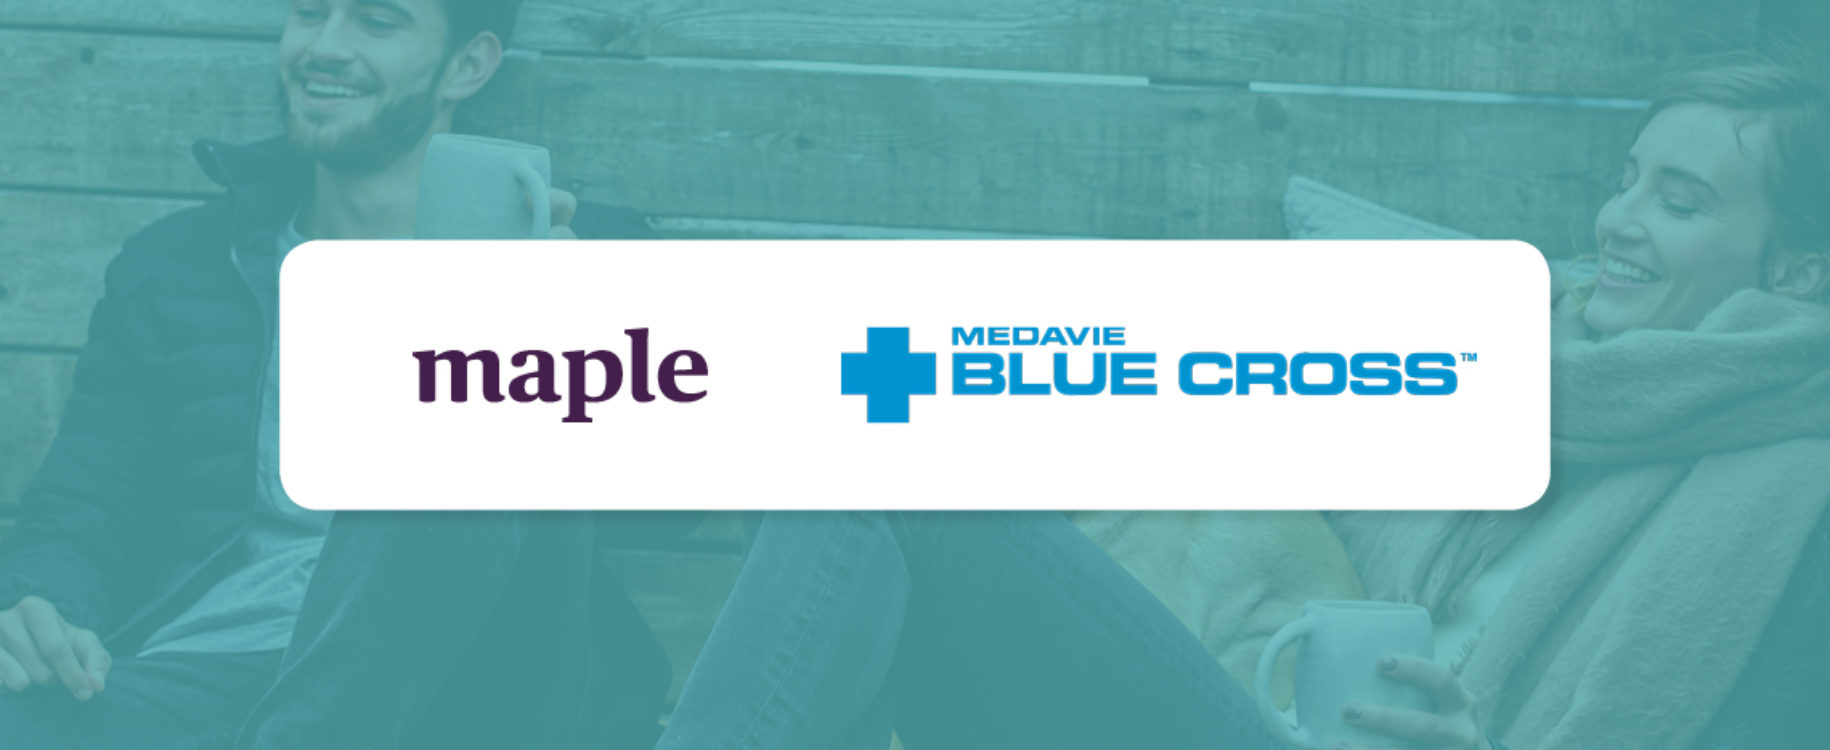 Medavie Blue Cross launches Connected Care digital health platform